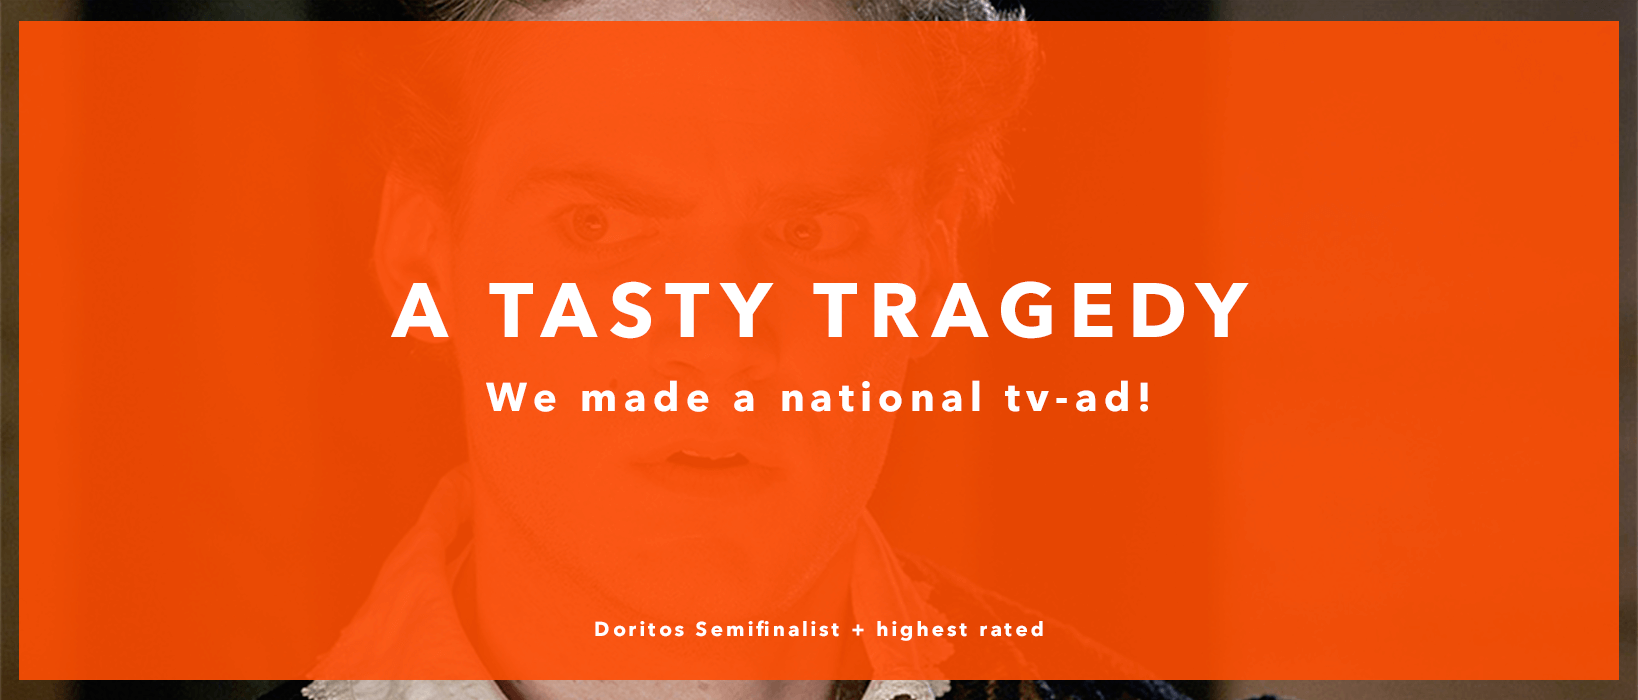 A Tasty Tragedy